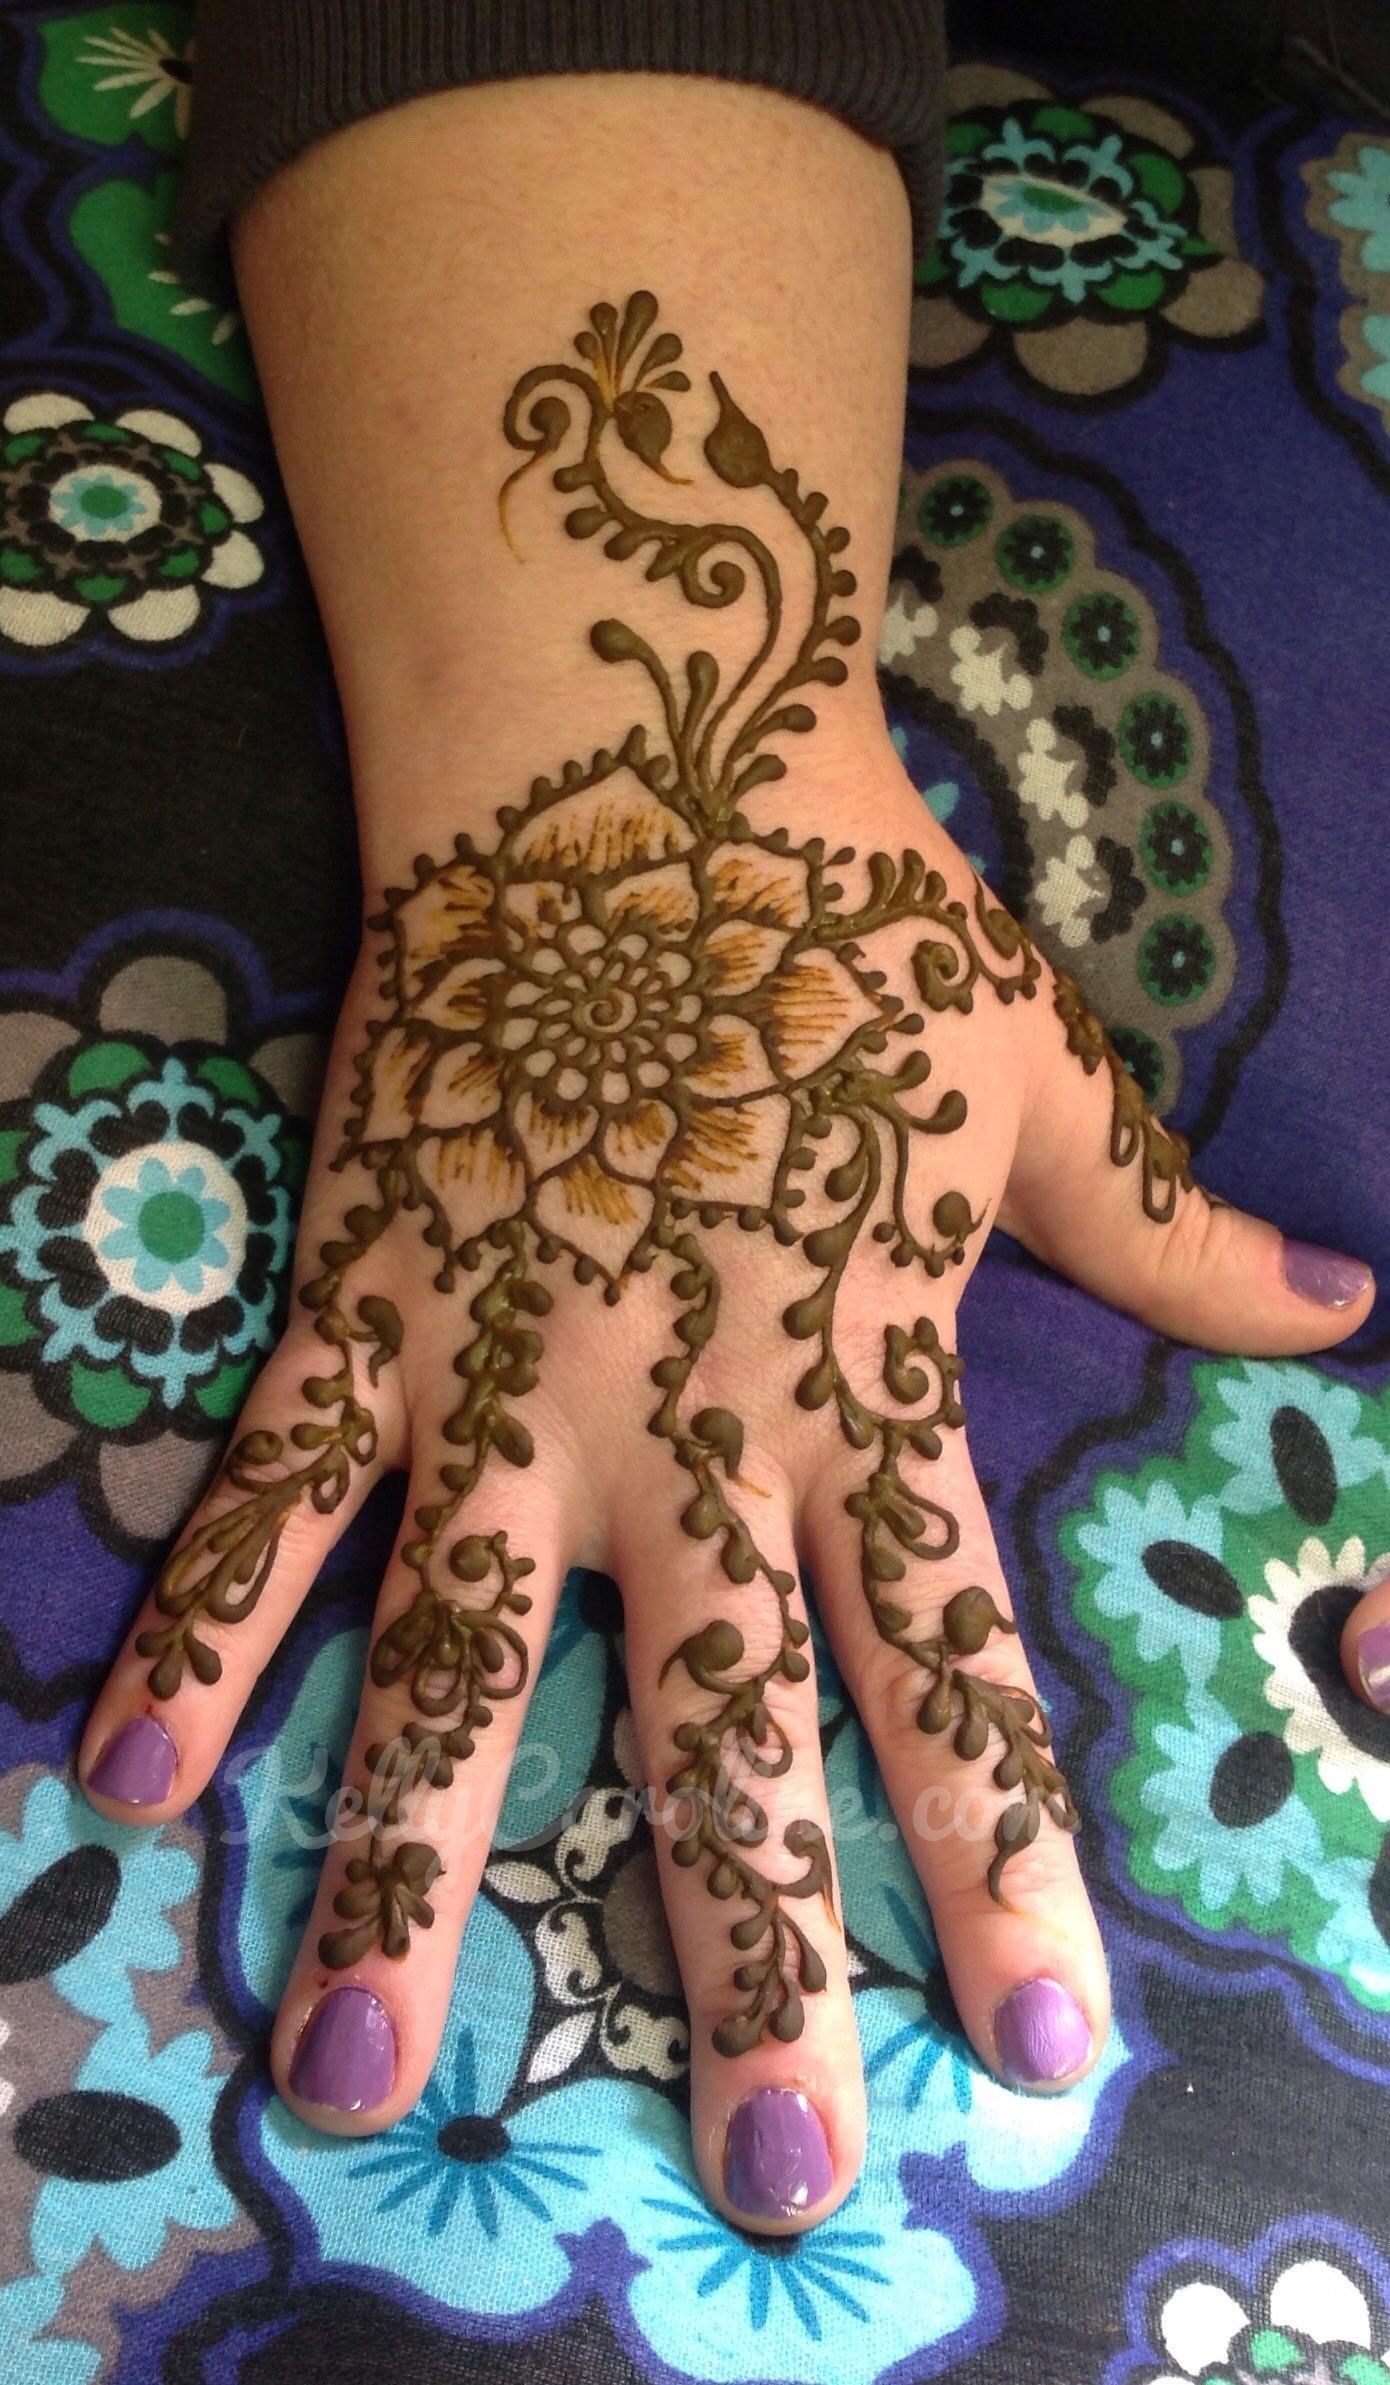 michigan henna artist archives kelly caroline kelly. Black Bedroom Furniture Sets. Home Design Ideas